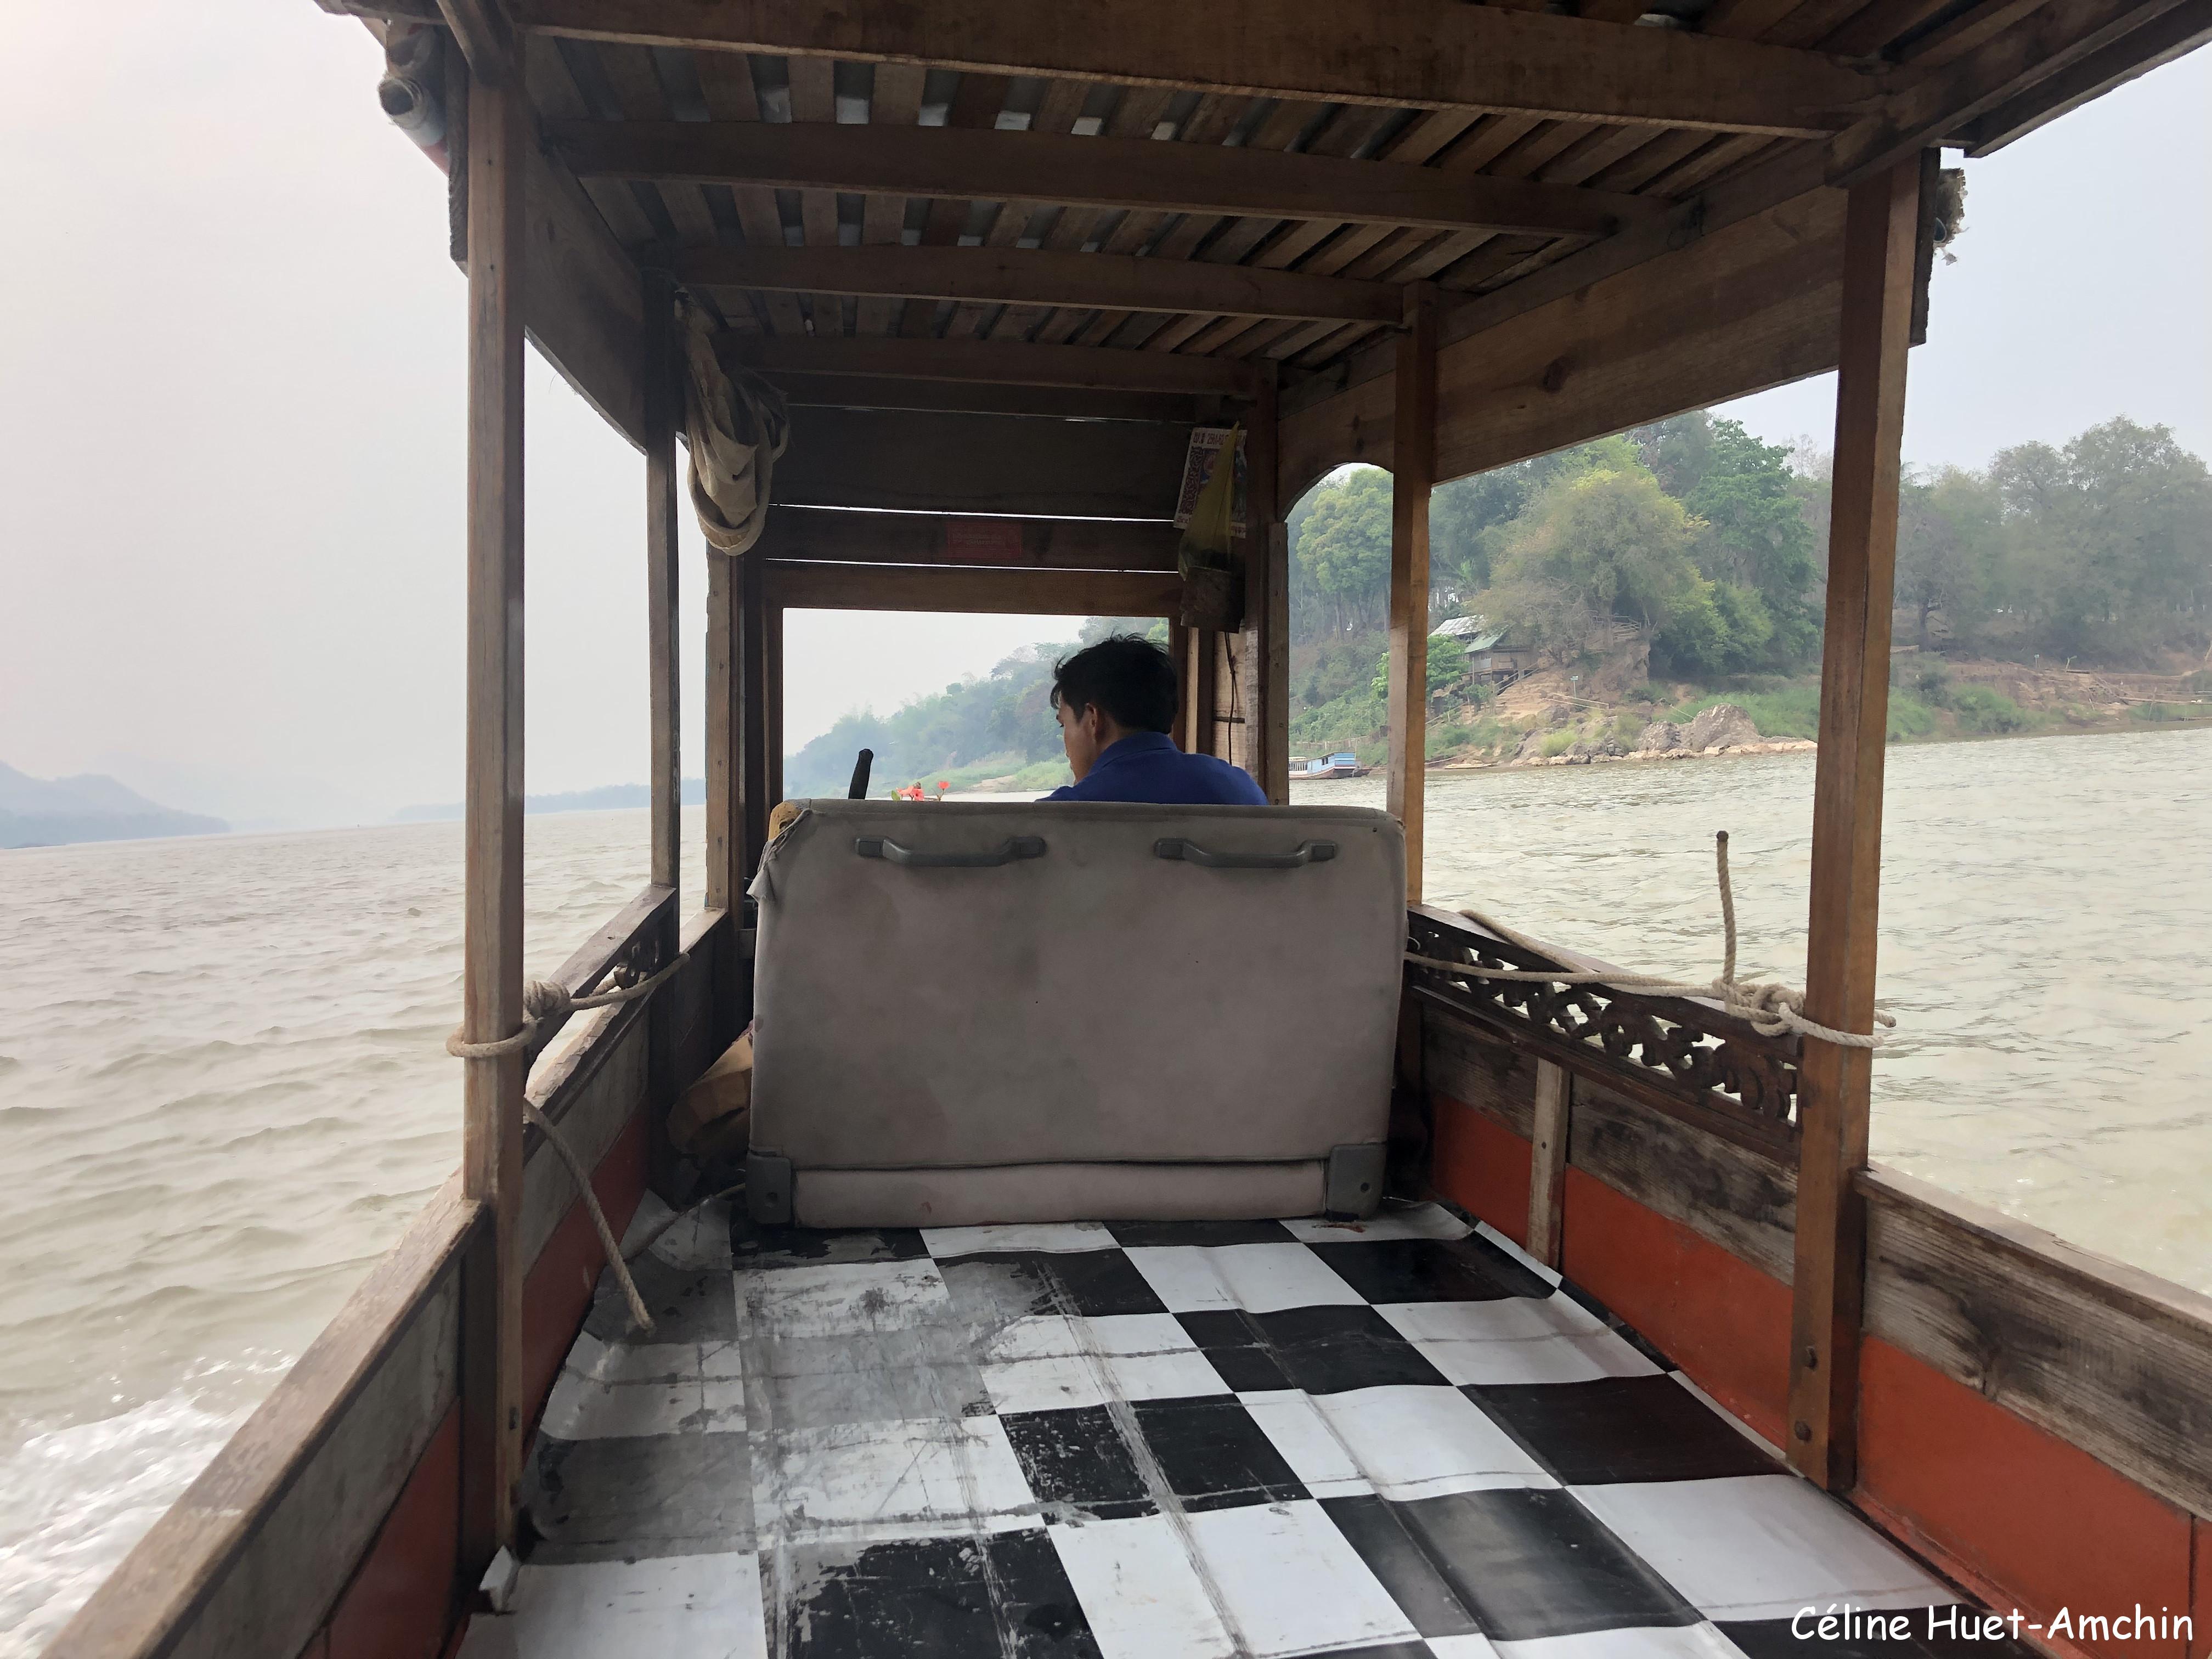 Bateau vers les grottes Mékong Luang Prabang Laos Asie